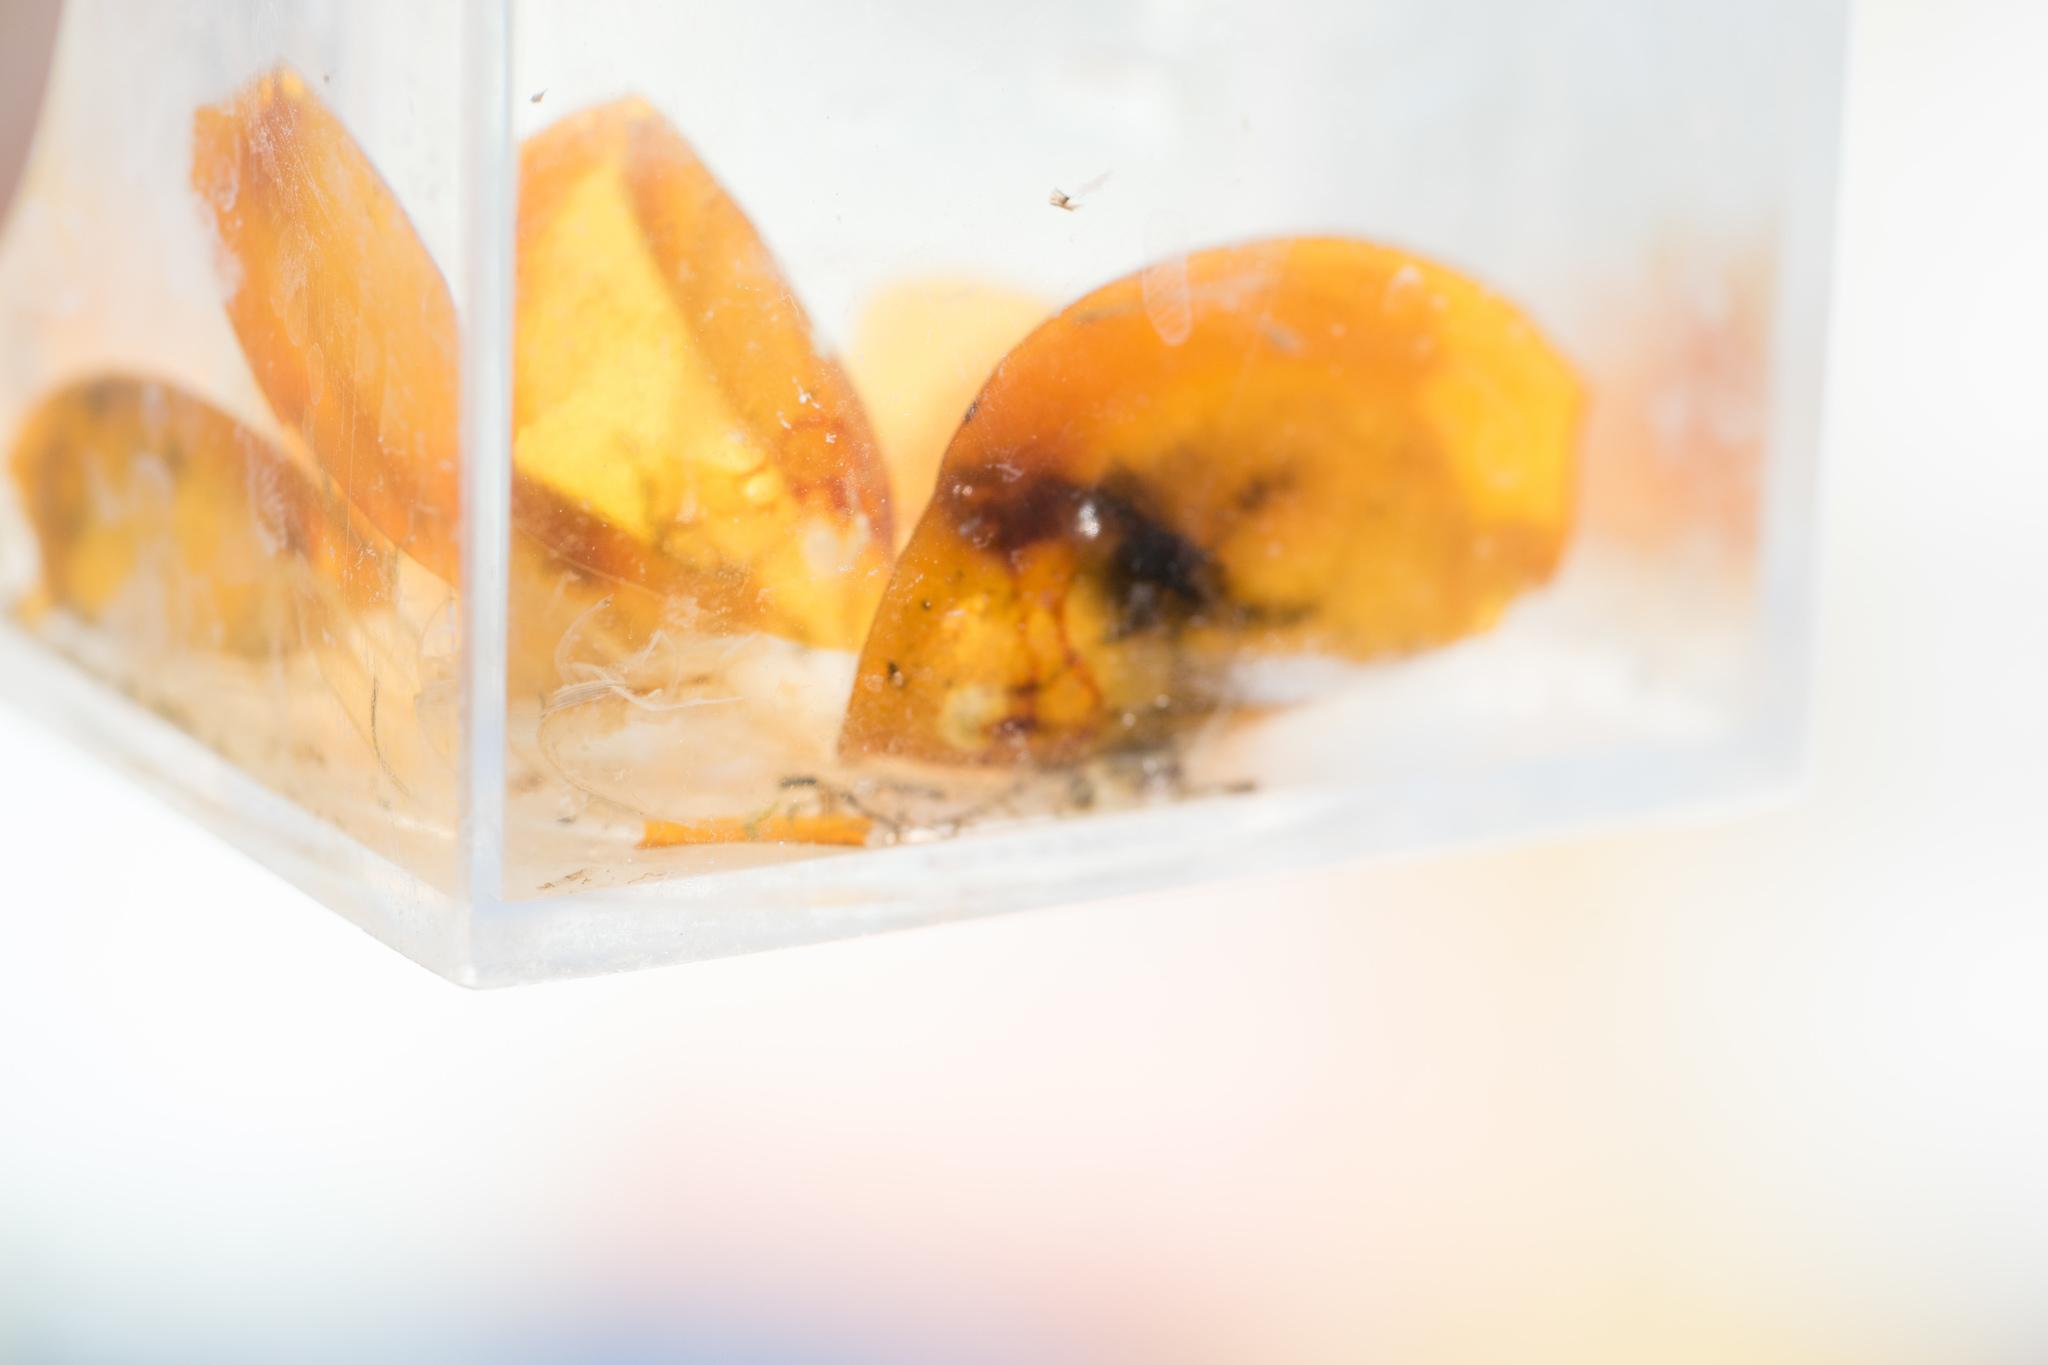 Image of Vernal pool tadpole shrimp